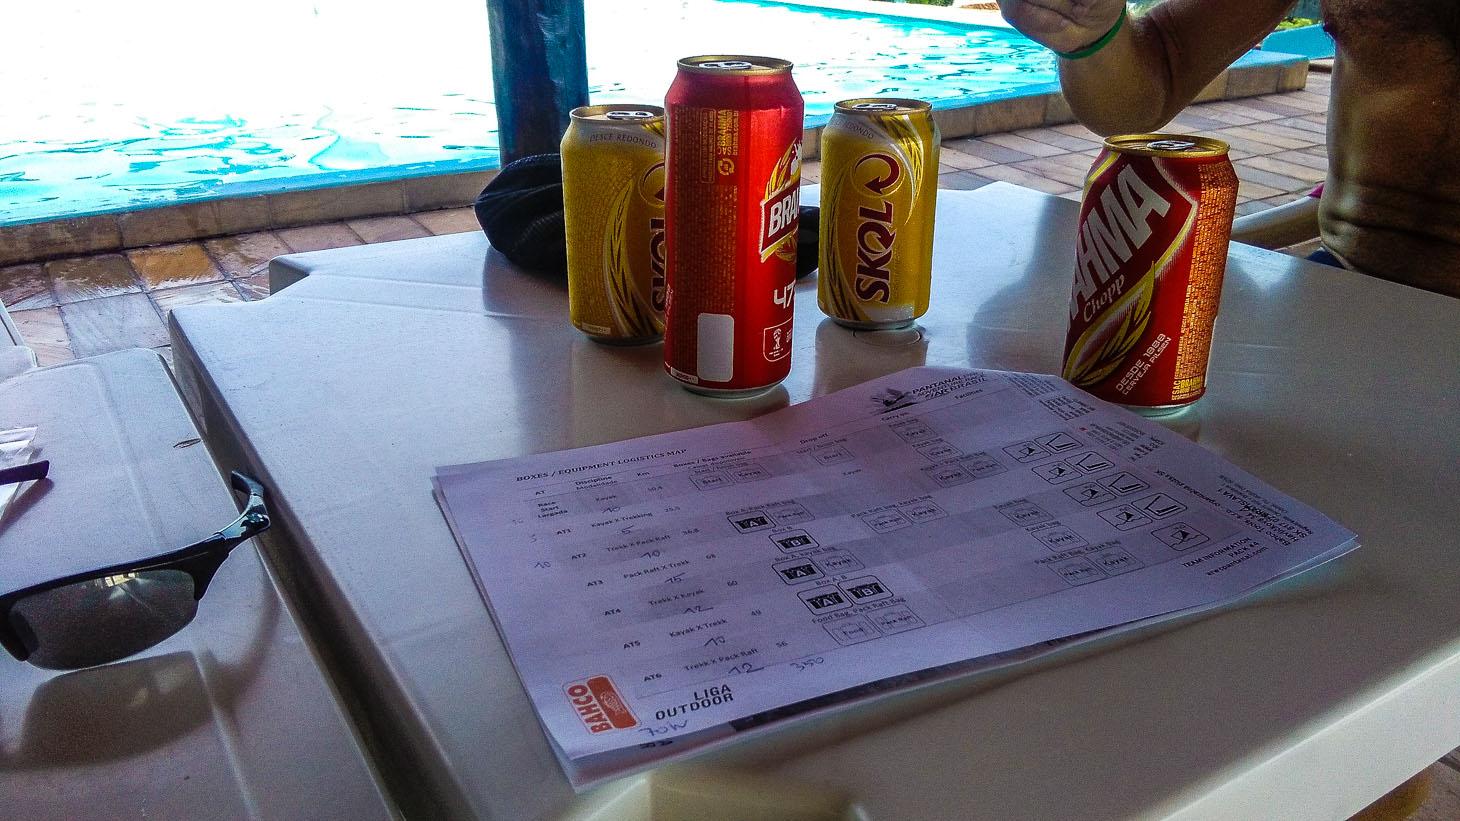 Taktická příprava - časové odhady a pitný režim